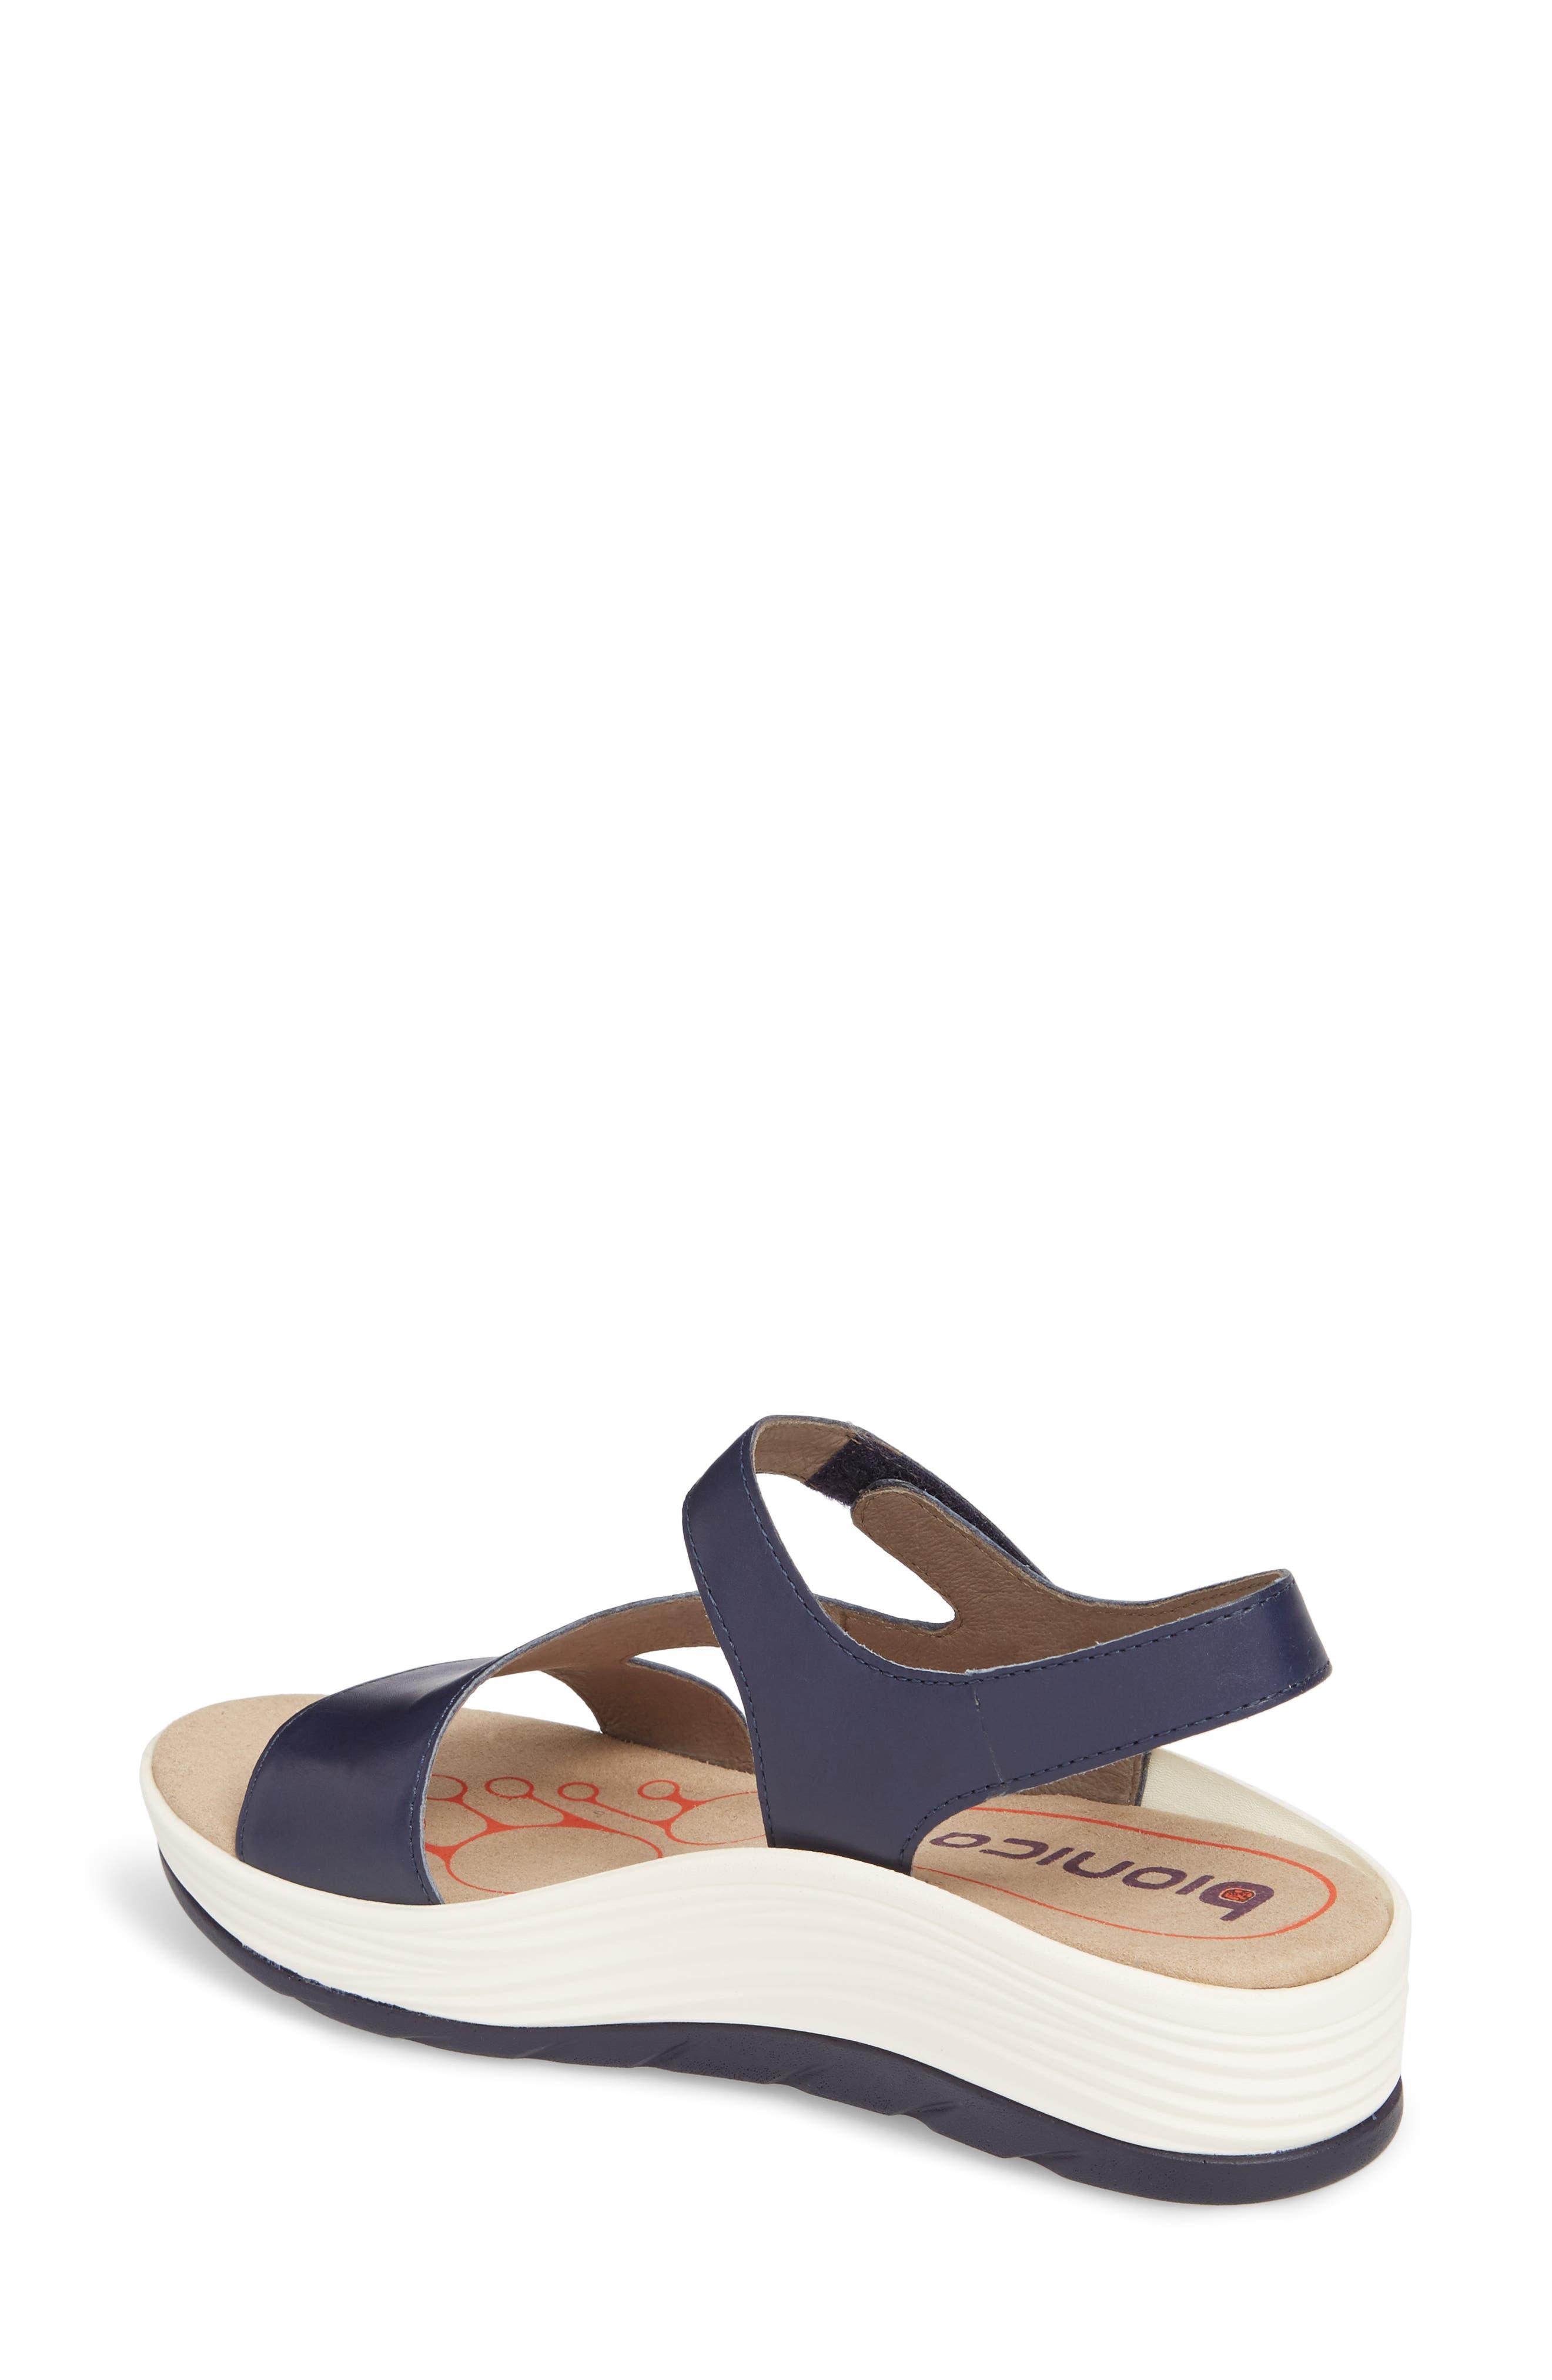 Cybele Platform Sandal,                             Alternate thumbnail 2, color,                             PEACOAT NAVY LEATHER